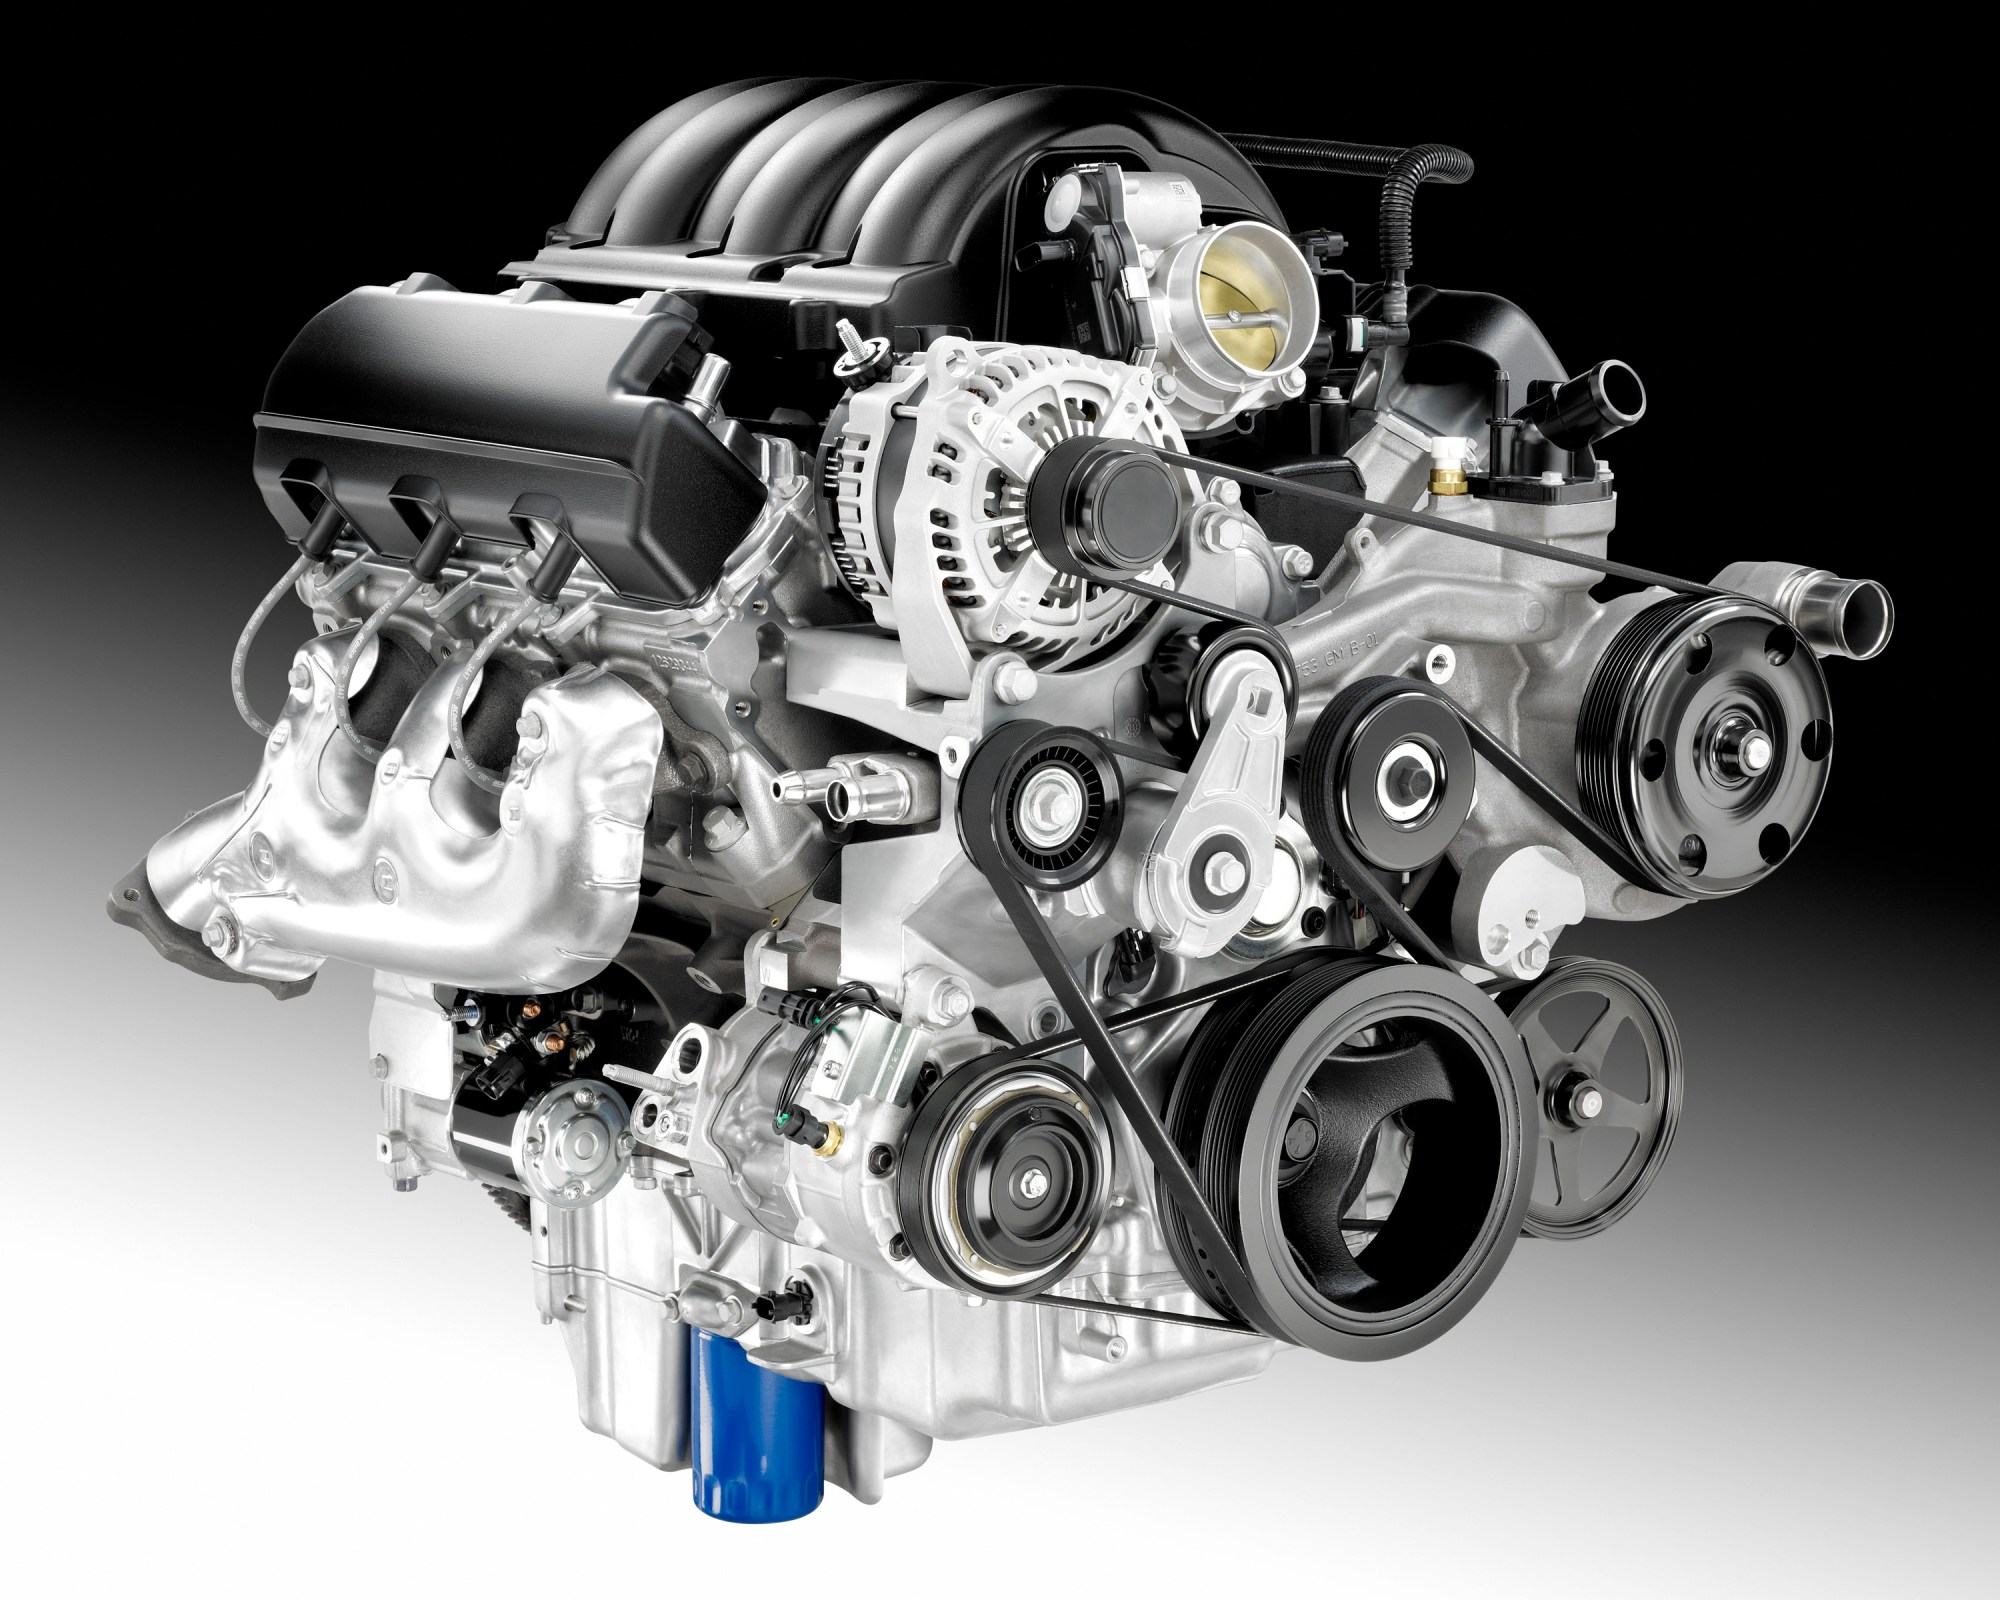 hight resolution of 2000 vw v6 engine diagram